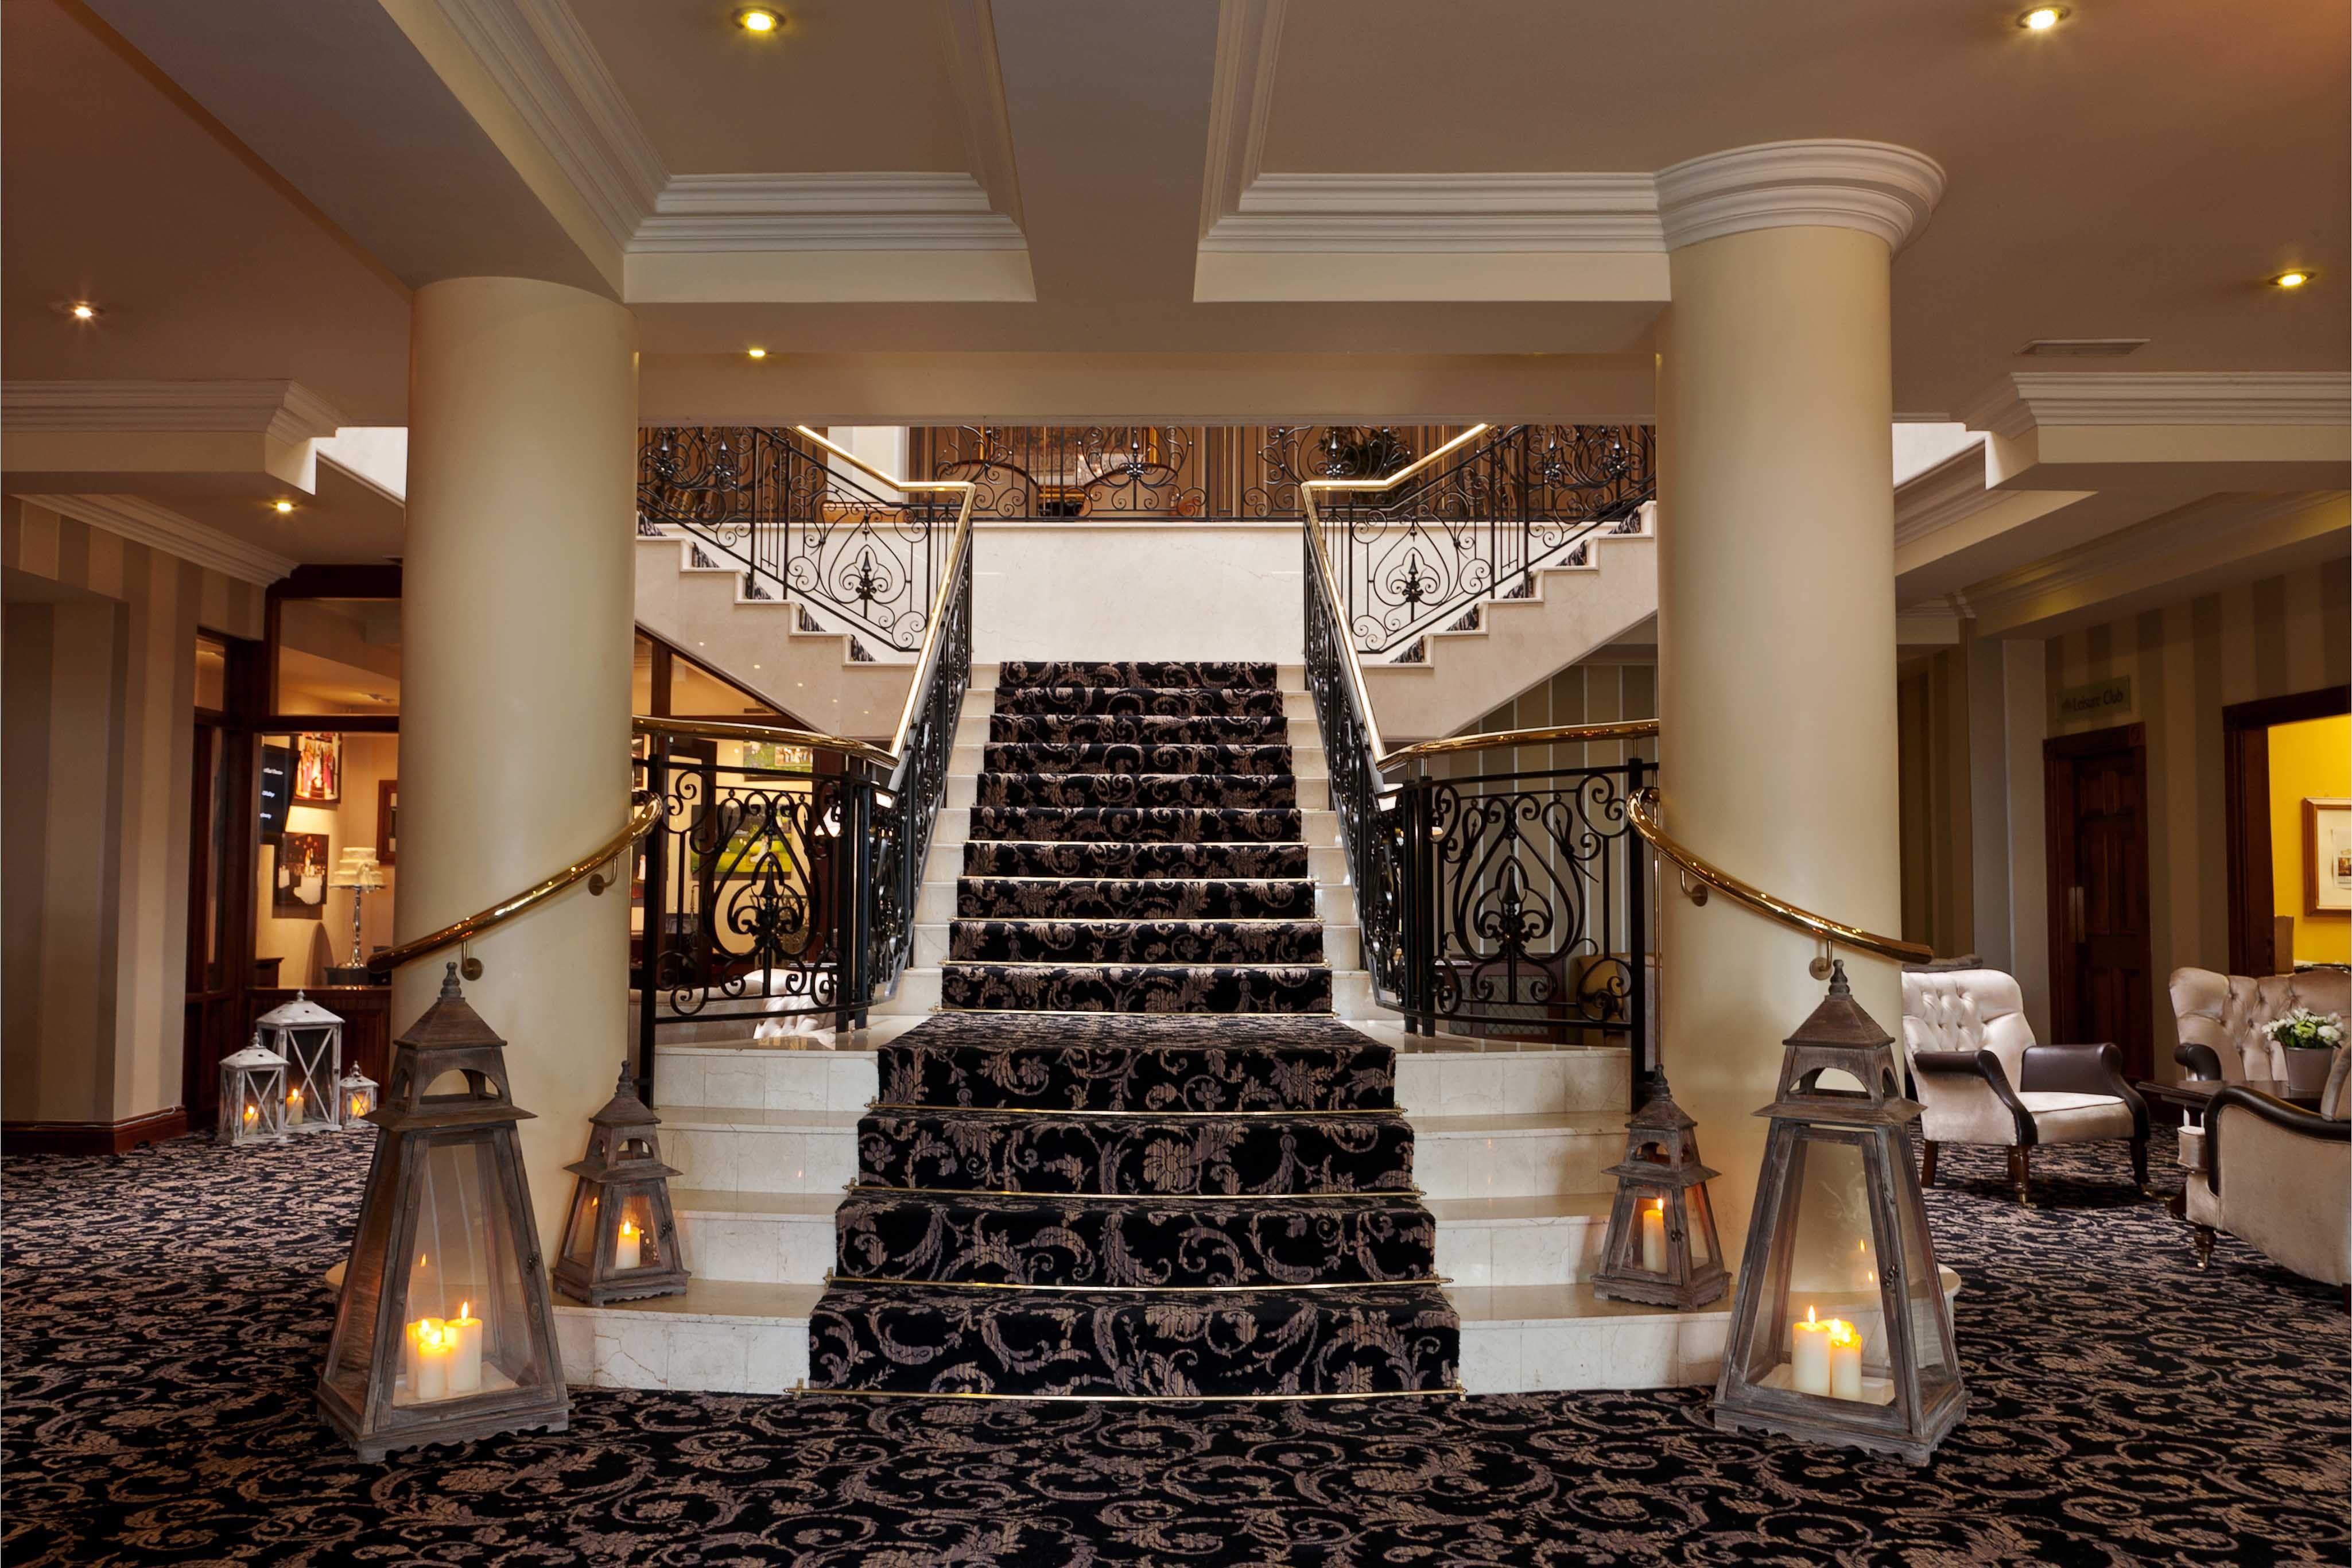 The beautiful bespoke stair case